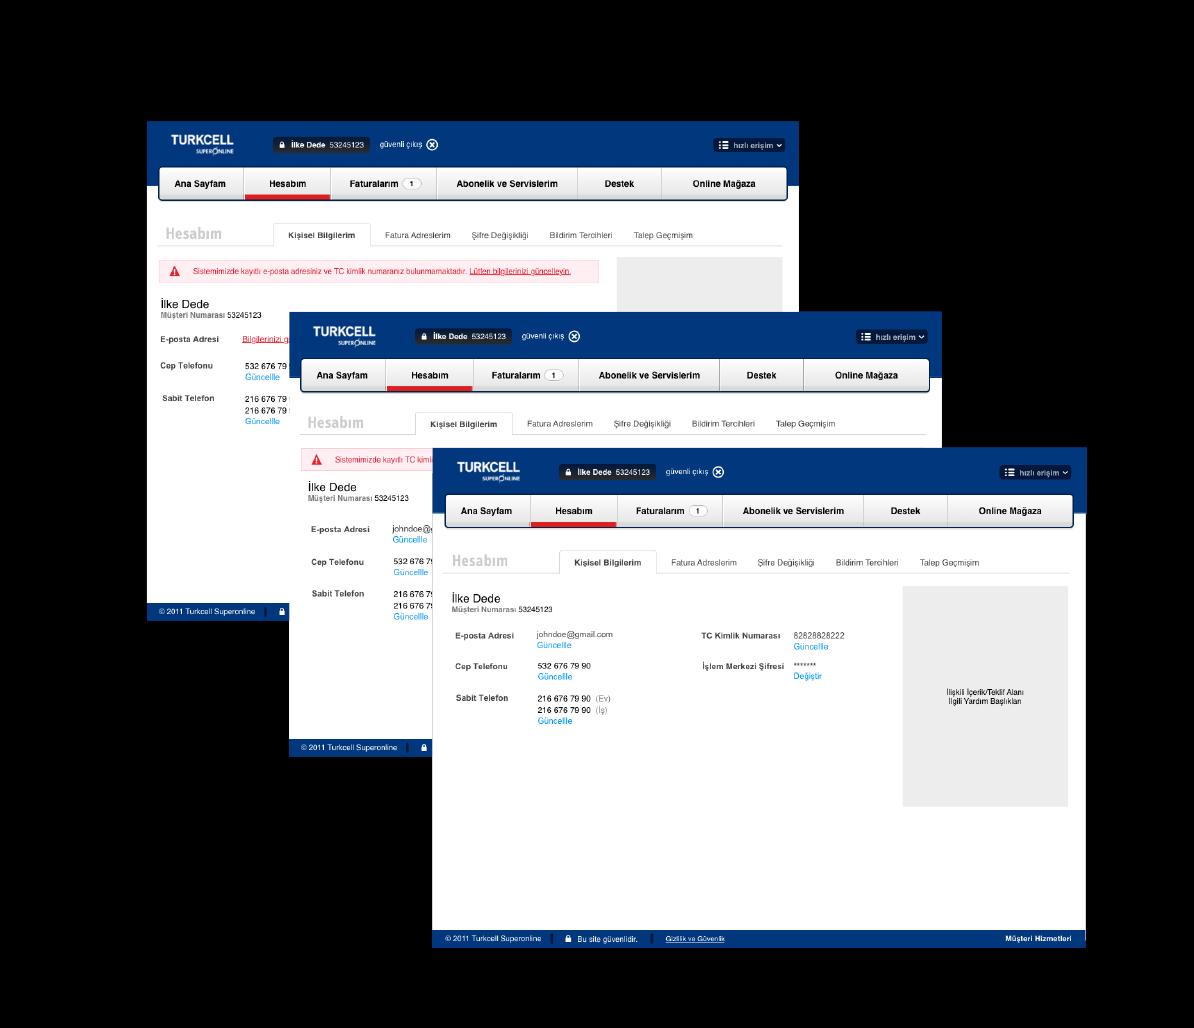 Managing personal information